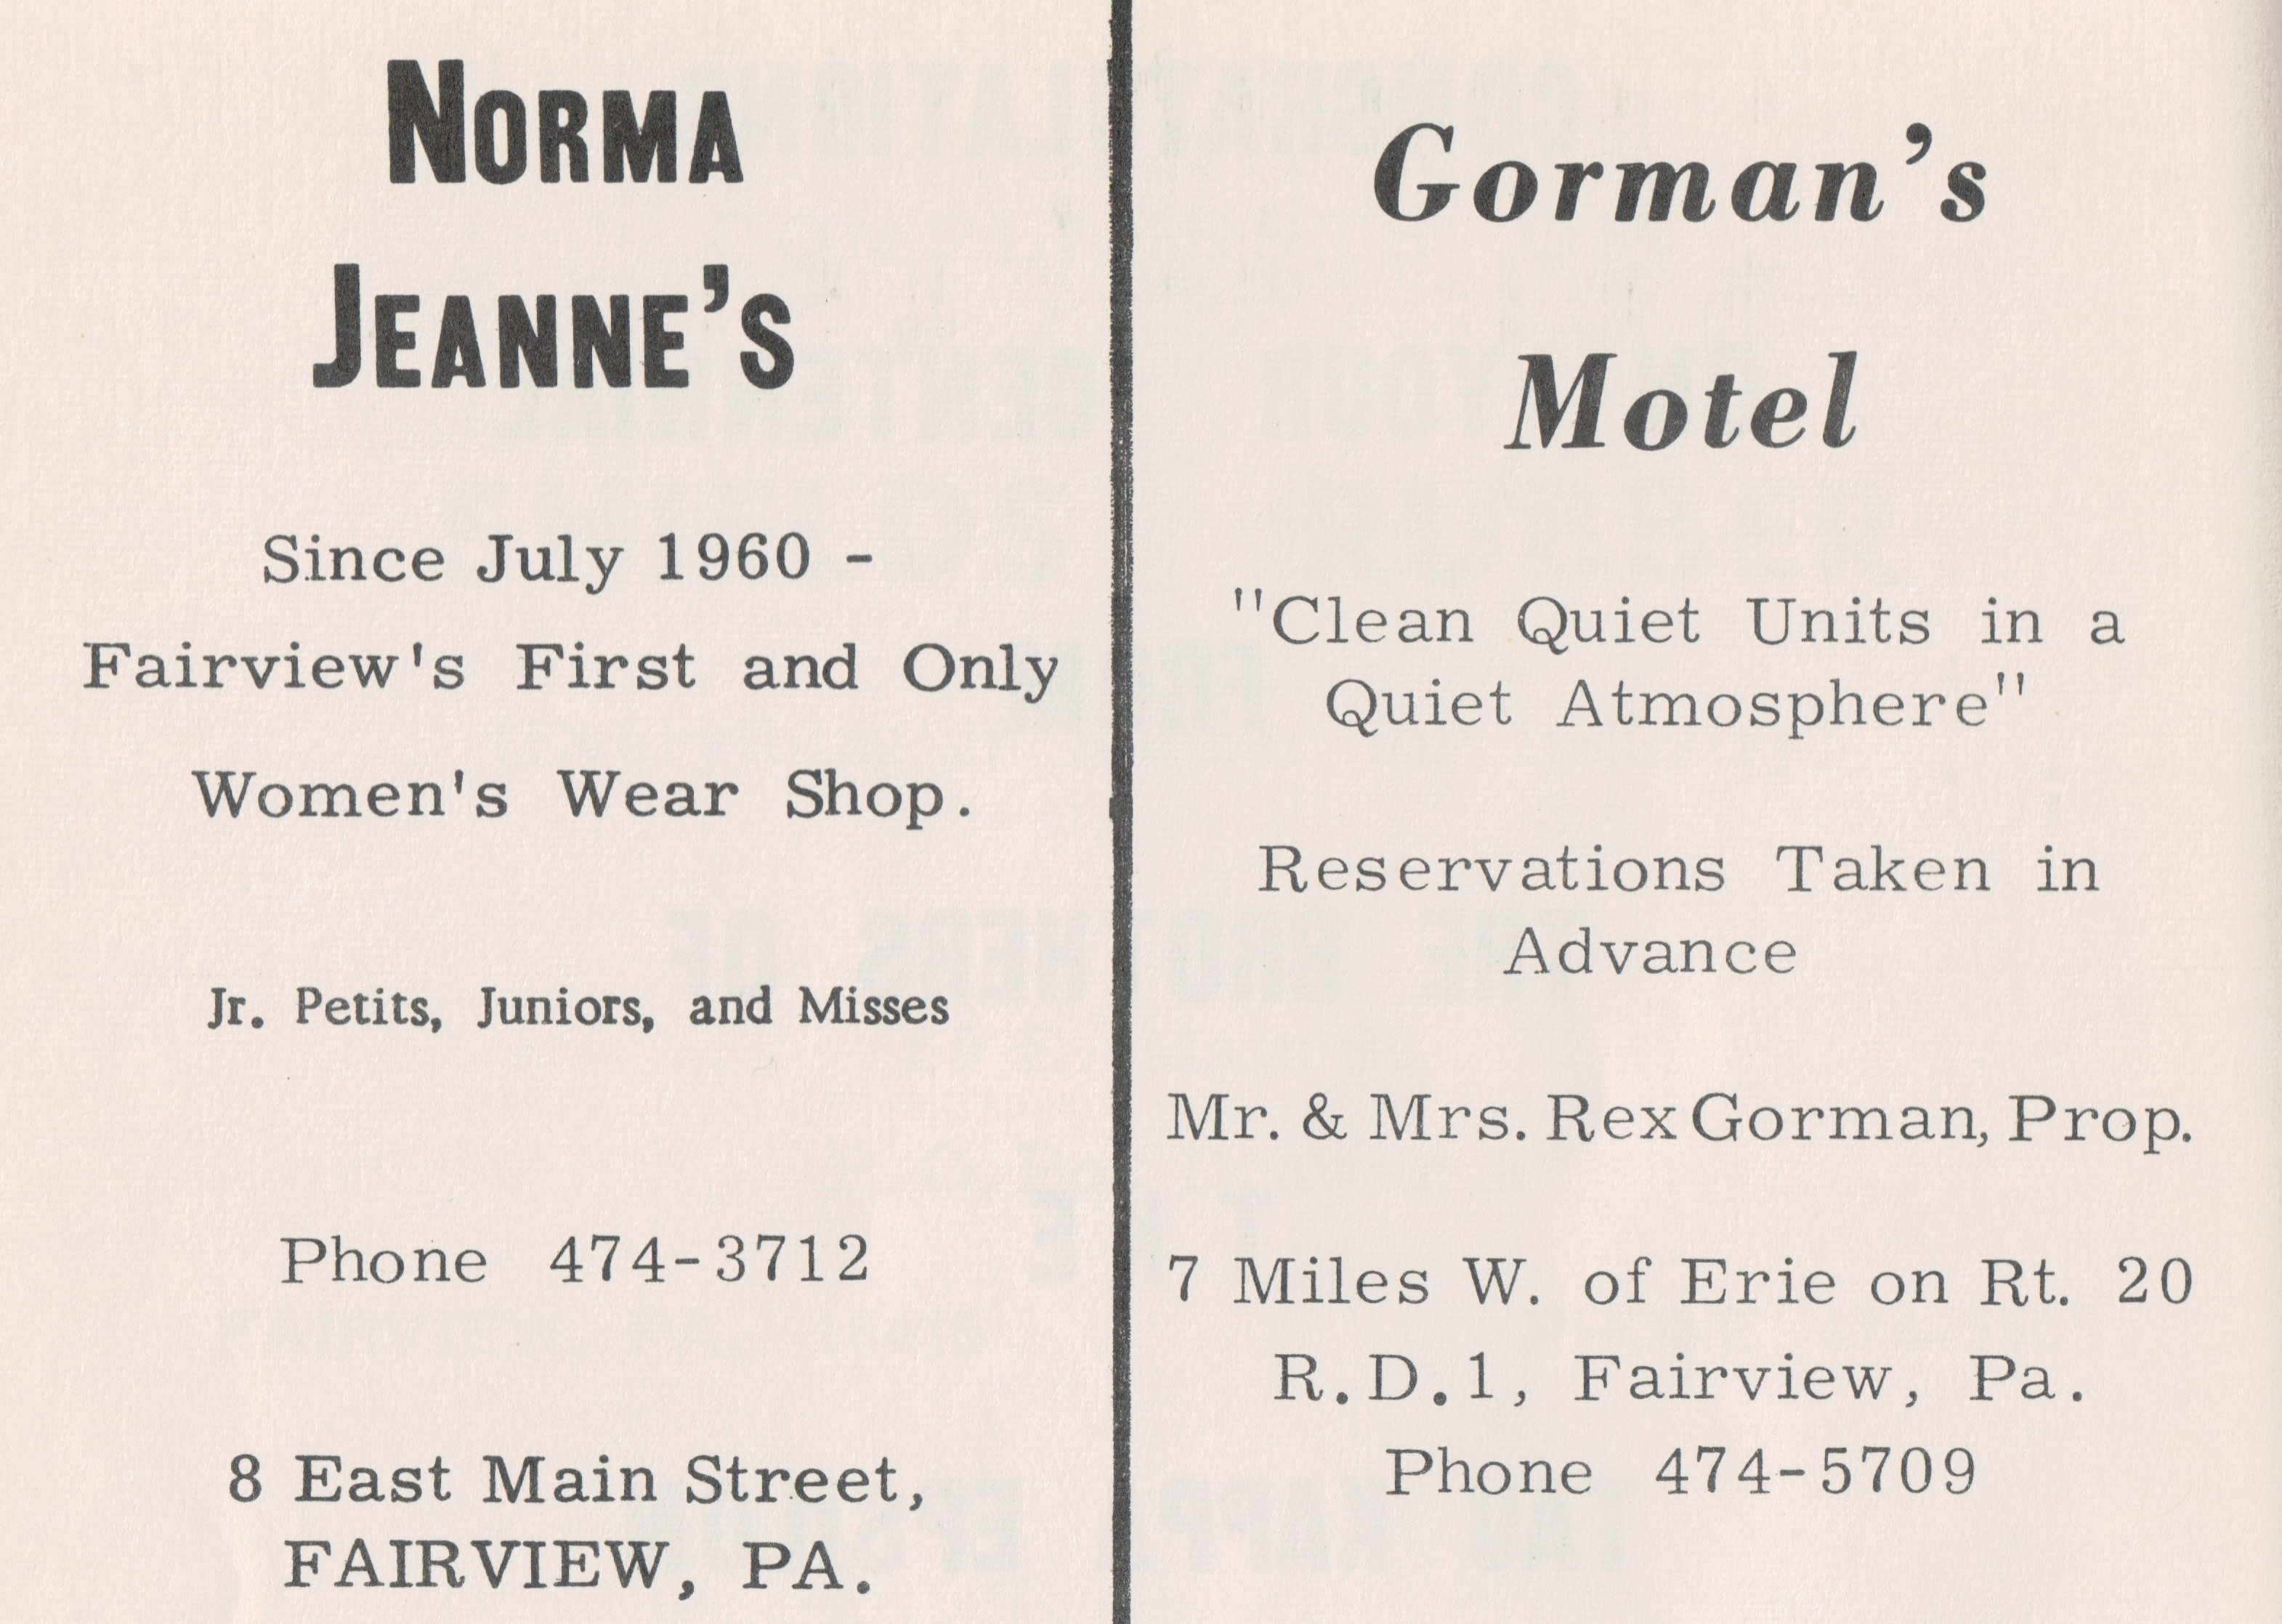 Norma Jeans & Gormans